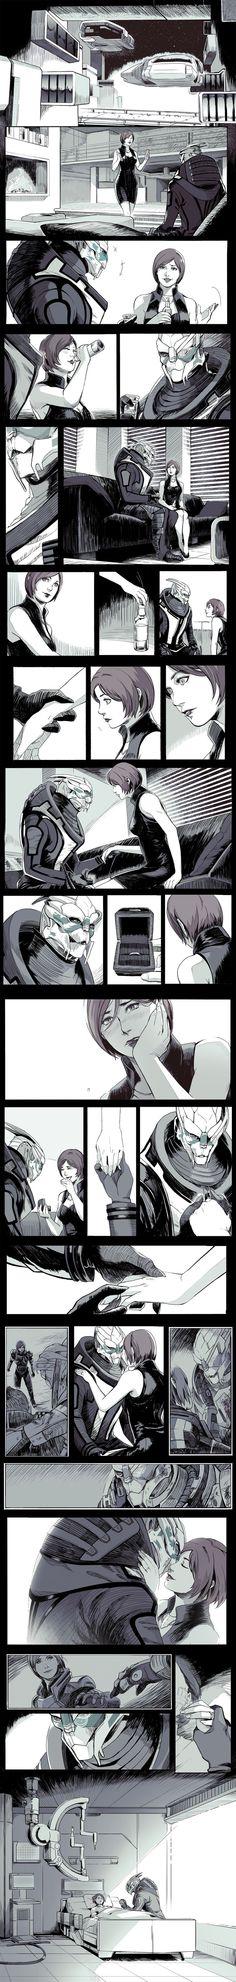 Mass Effect,фэндомы,Garrus,ME персонажи,Femshep,ME комиксы,wei723